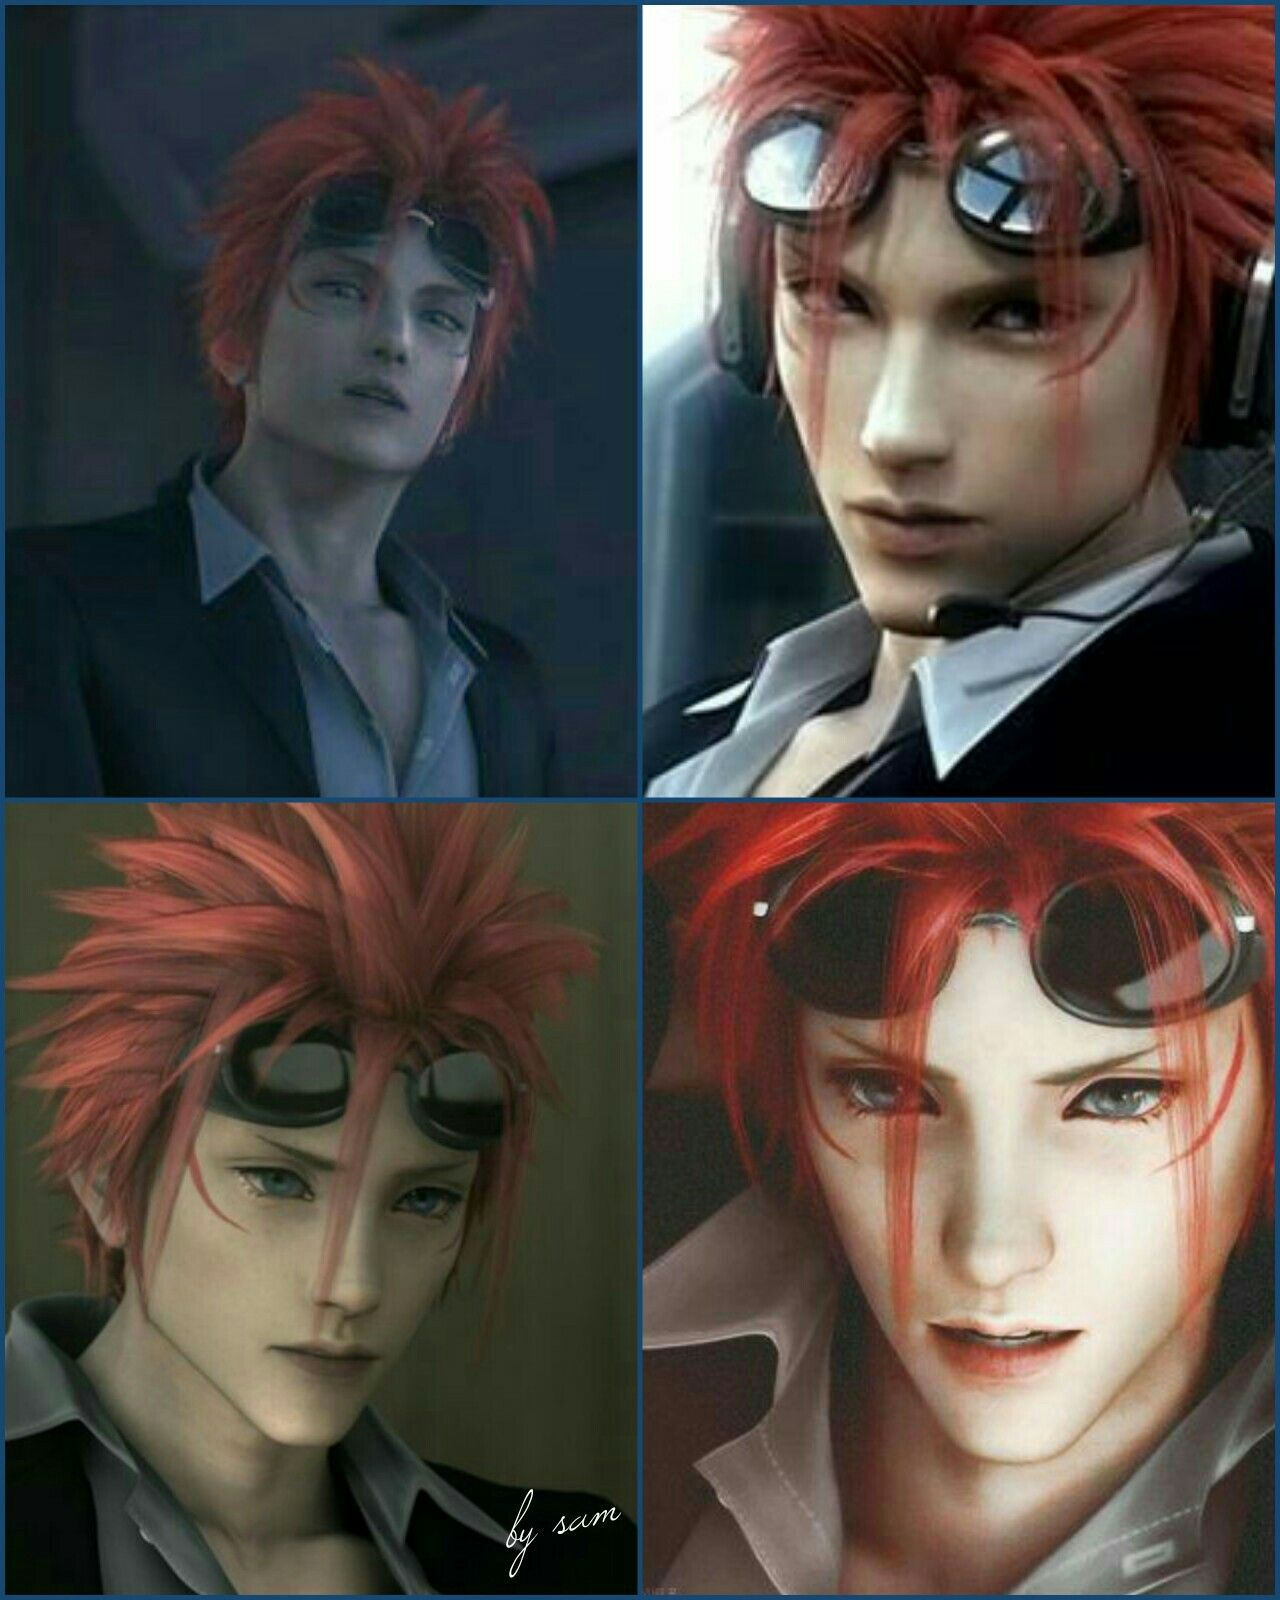 Pin by Desiree Mills on Final Fantasy VII in 2020 Reno